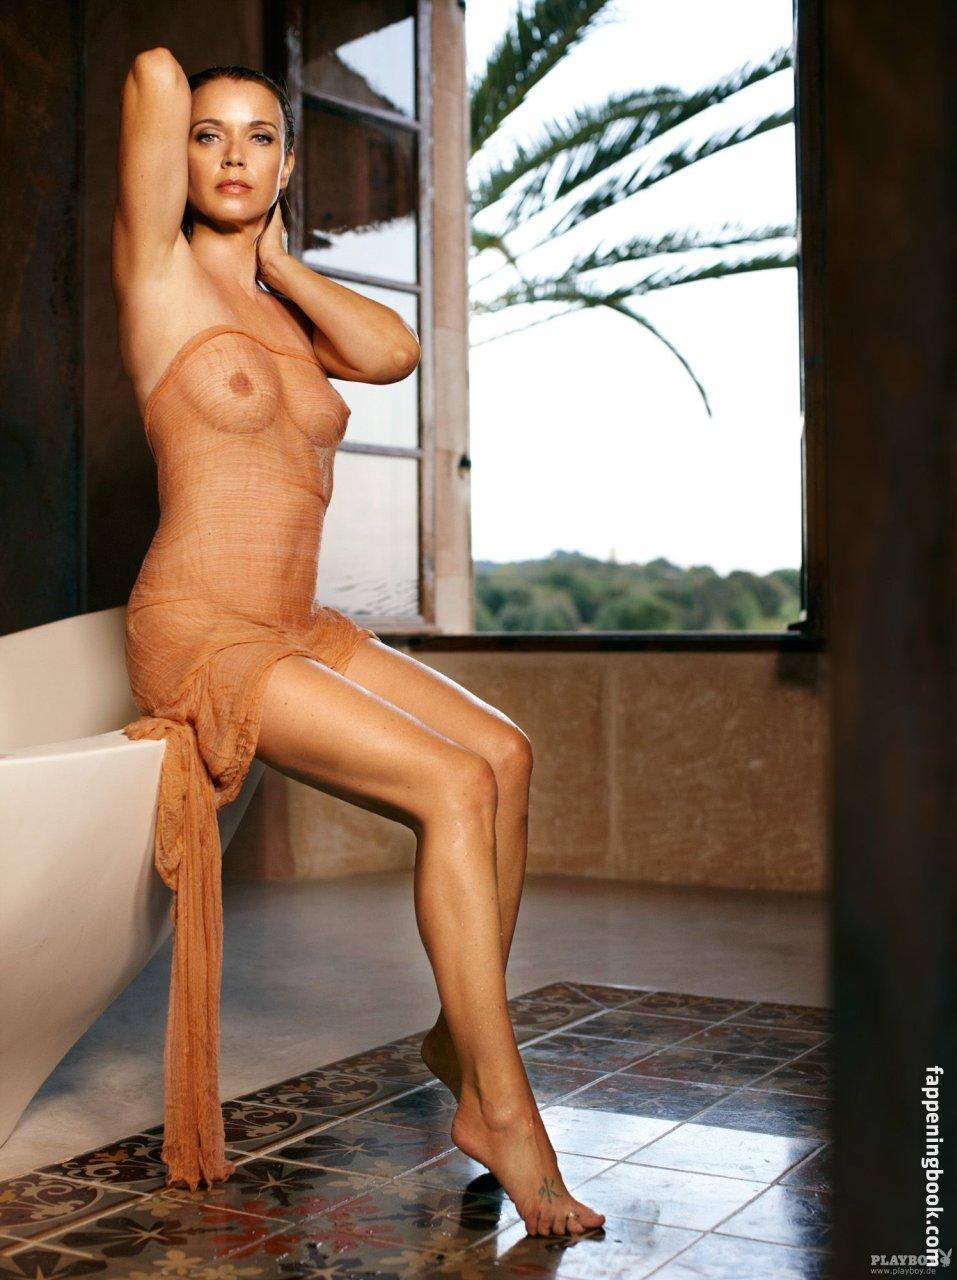 Katrin weber nude